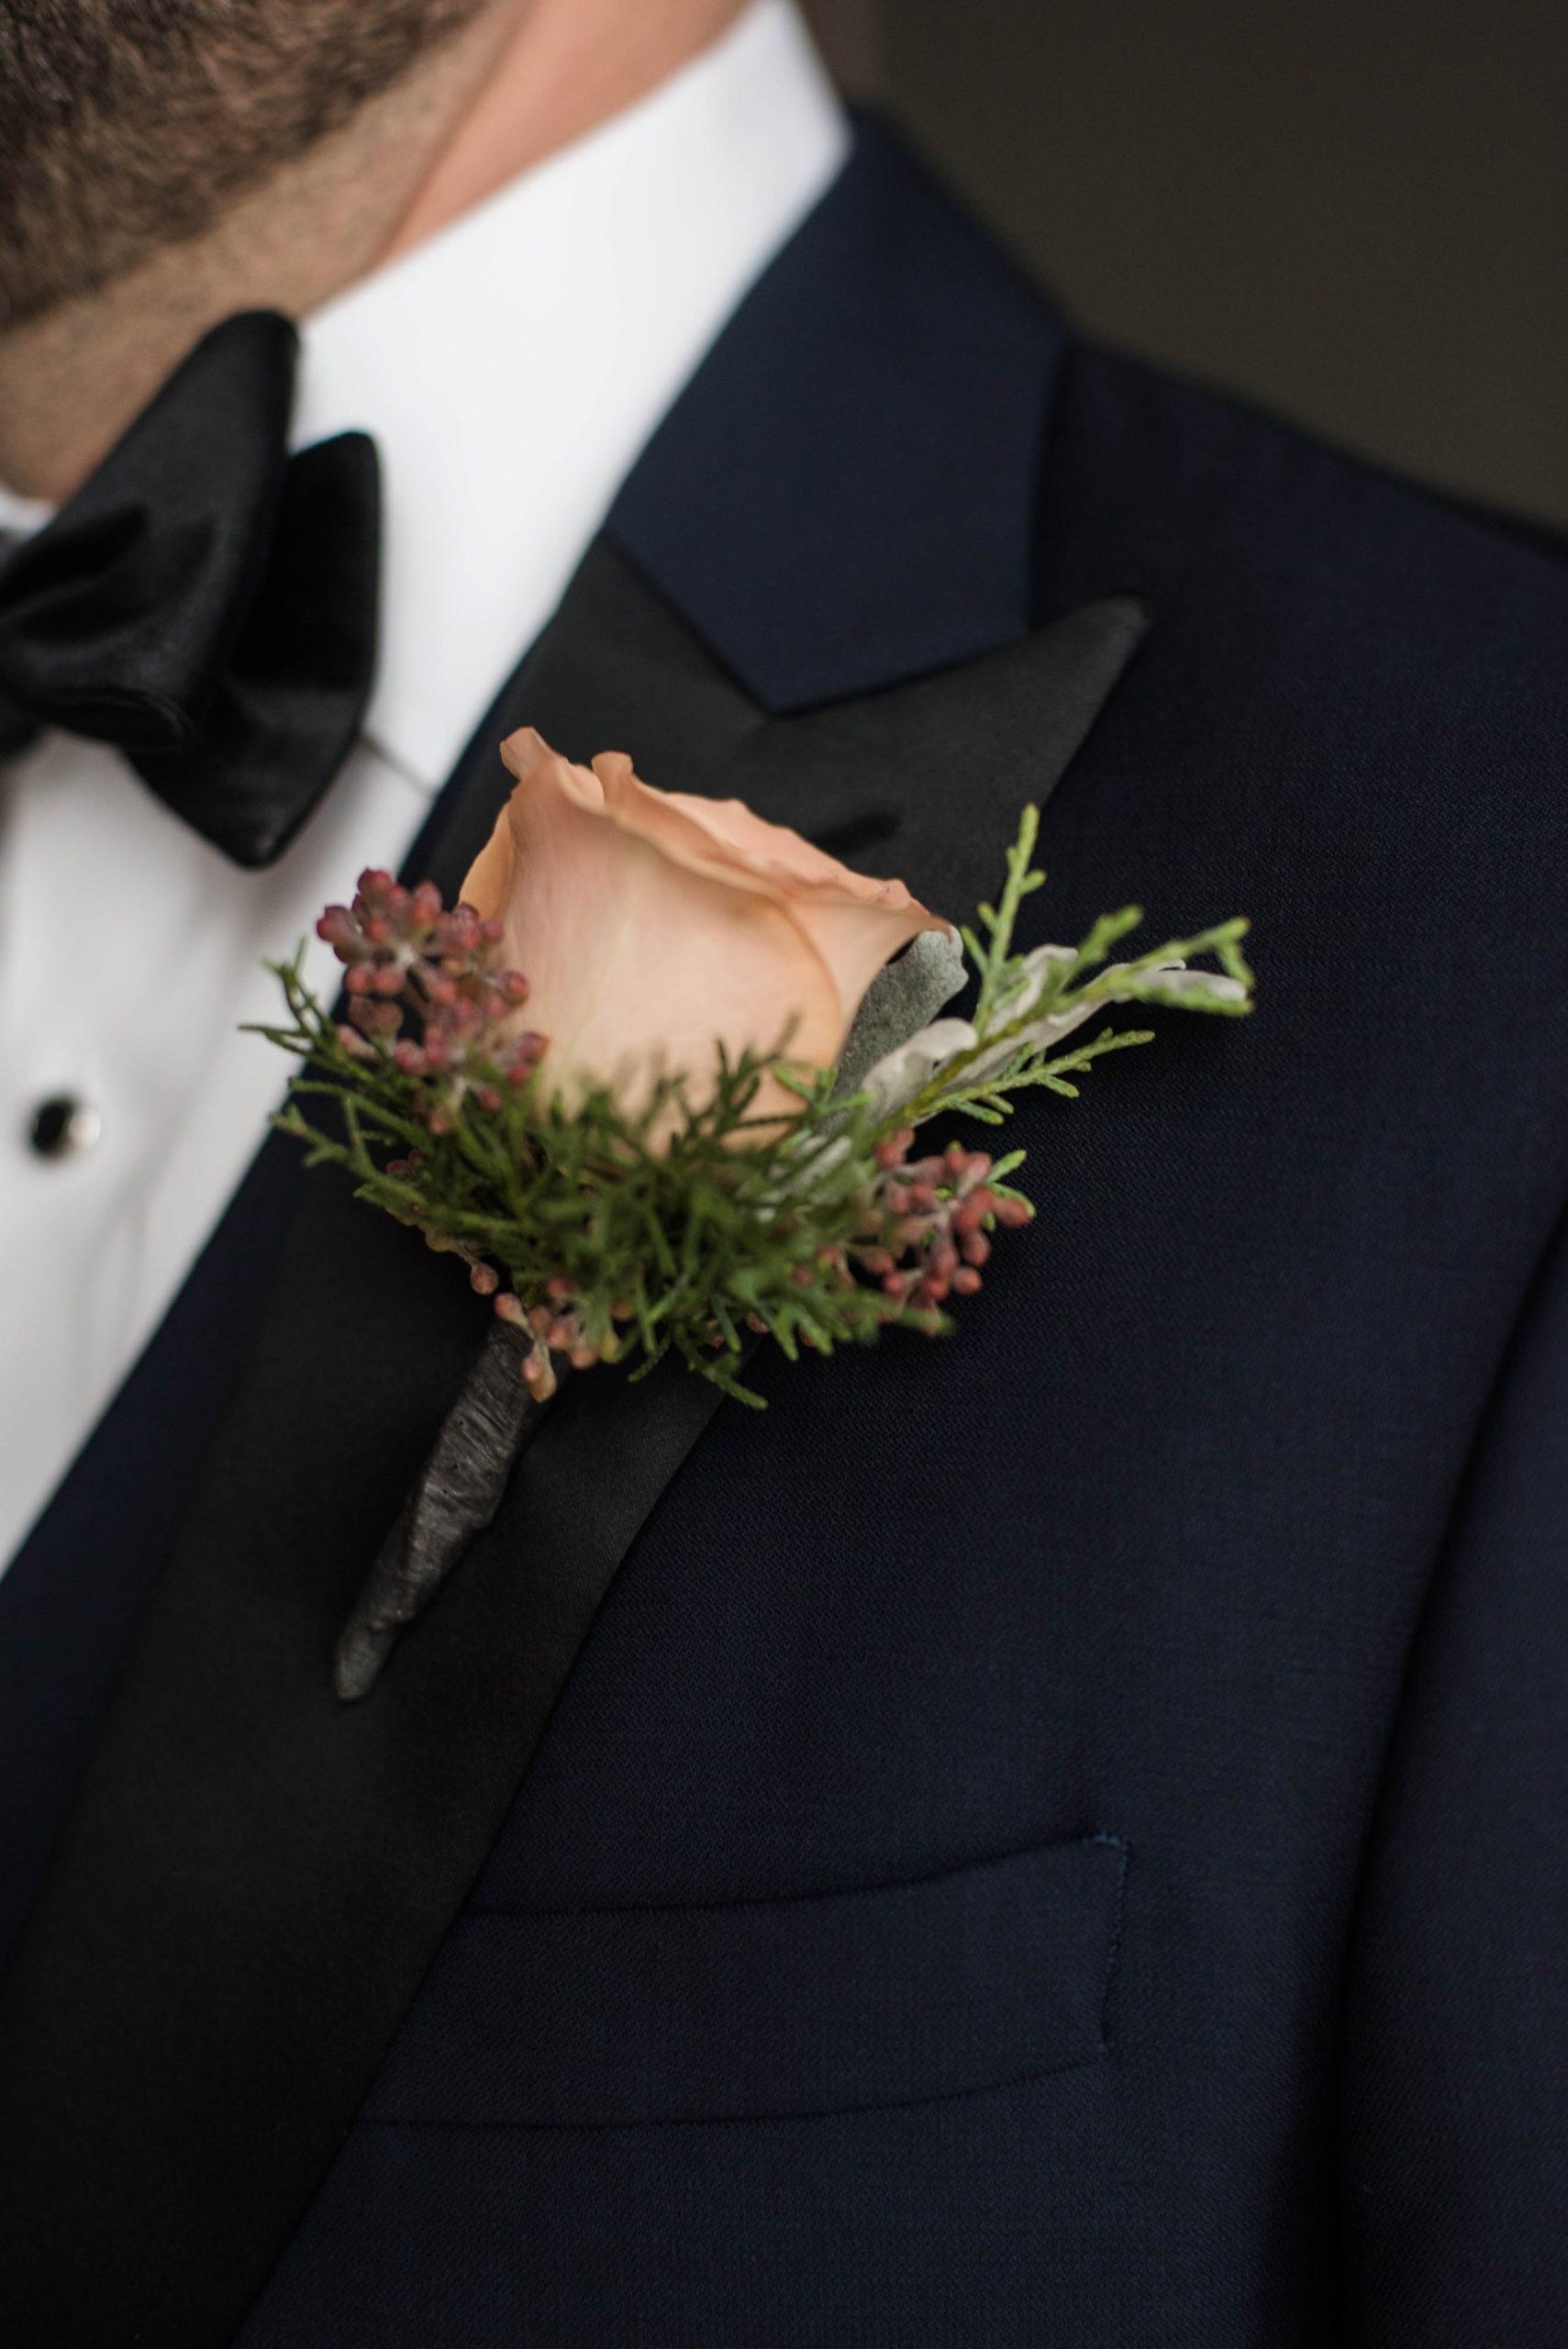 Romantic Winter Wedding Boutonniere